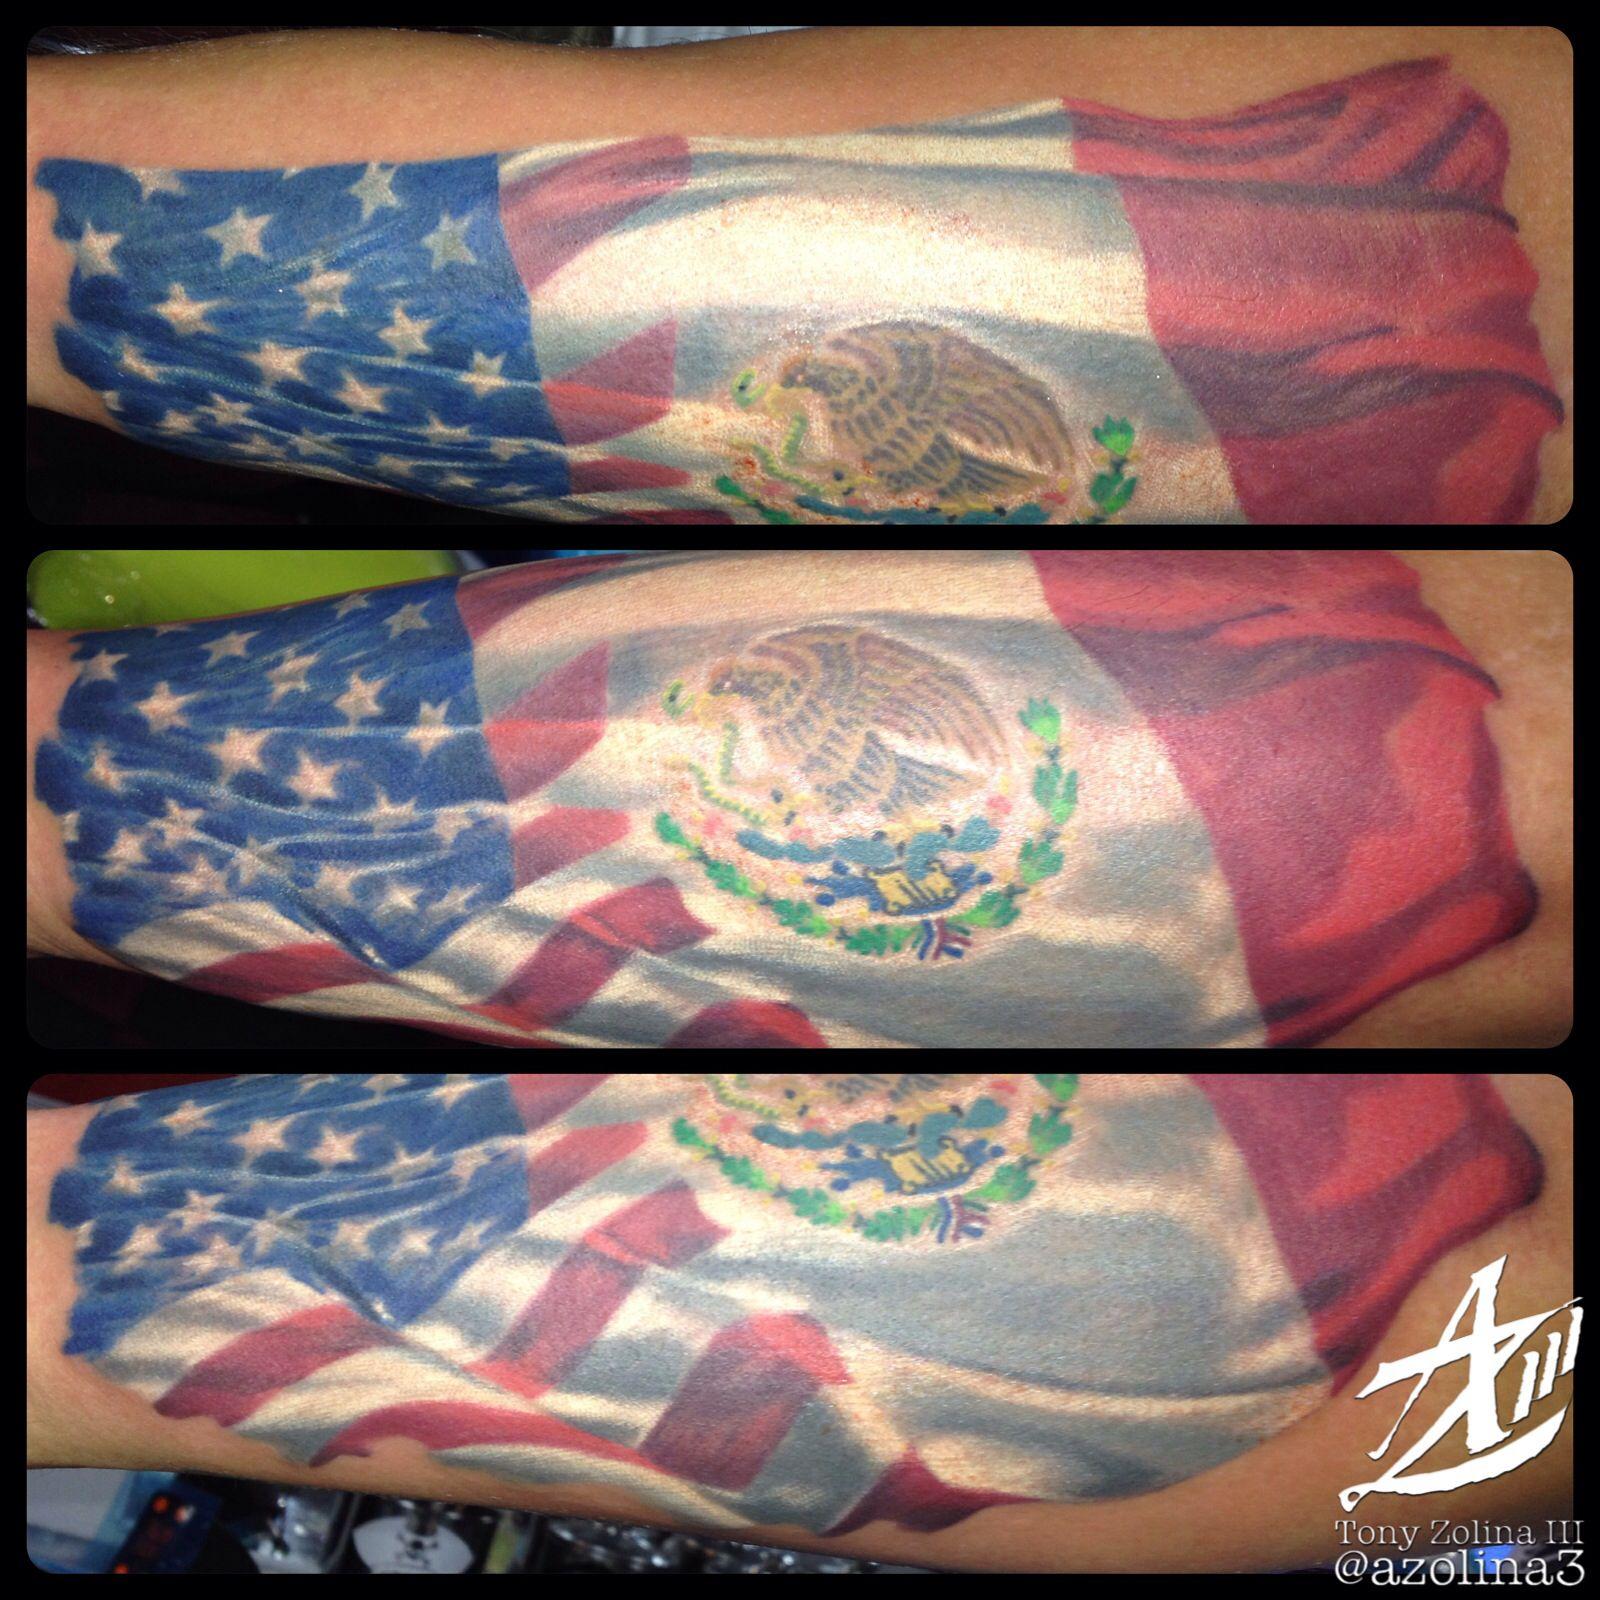 American/Mexican flag on forearm | Aquanaut Tattoo ...